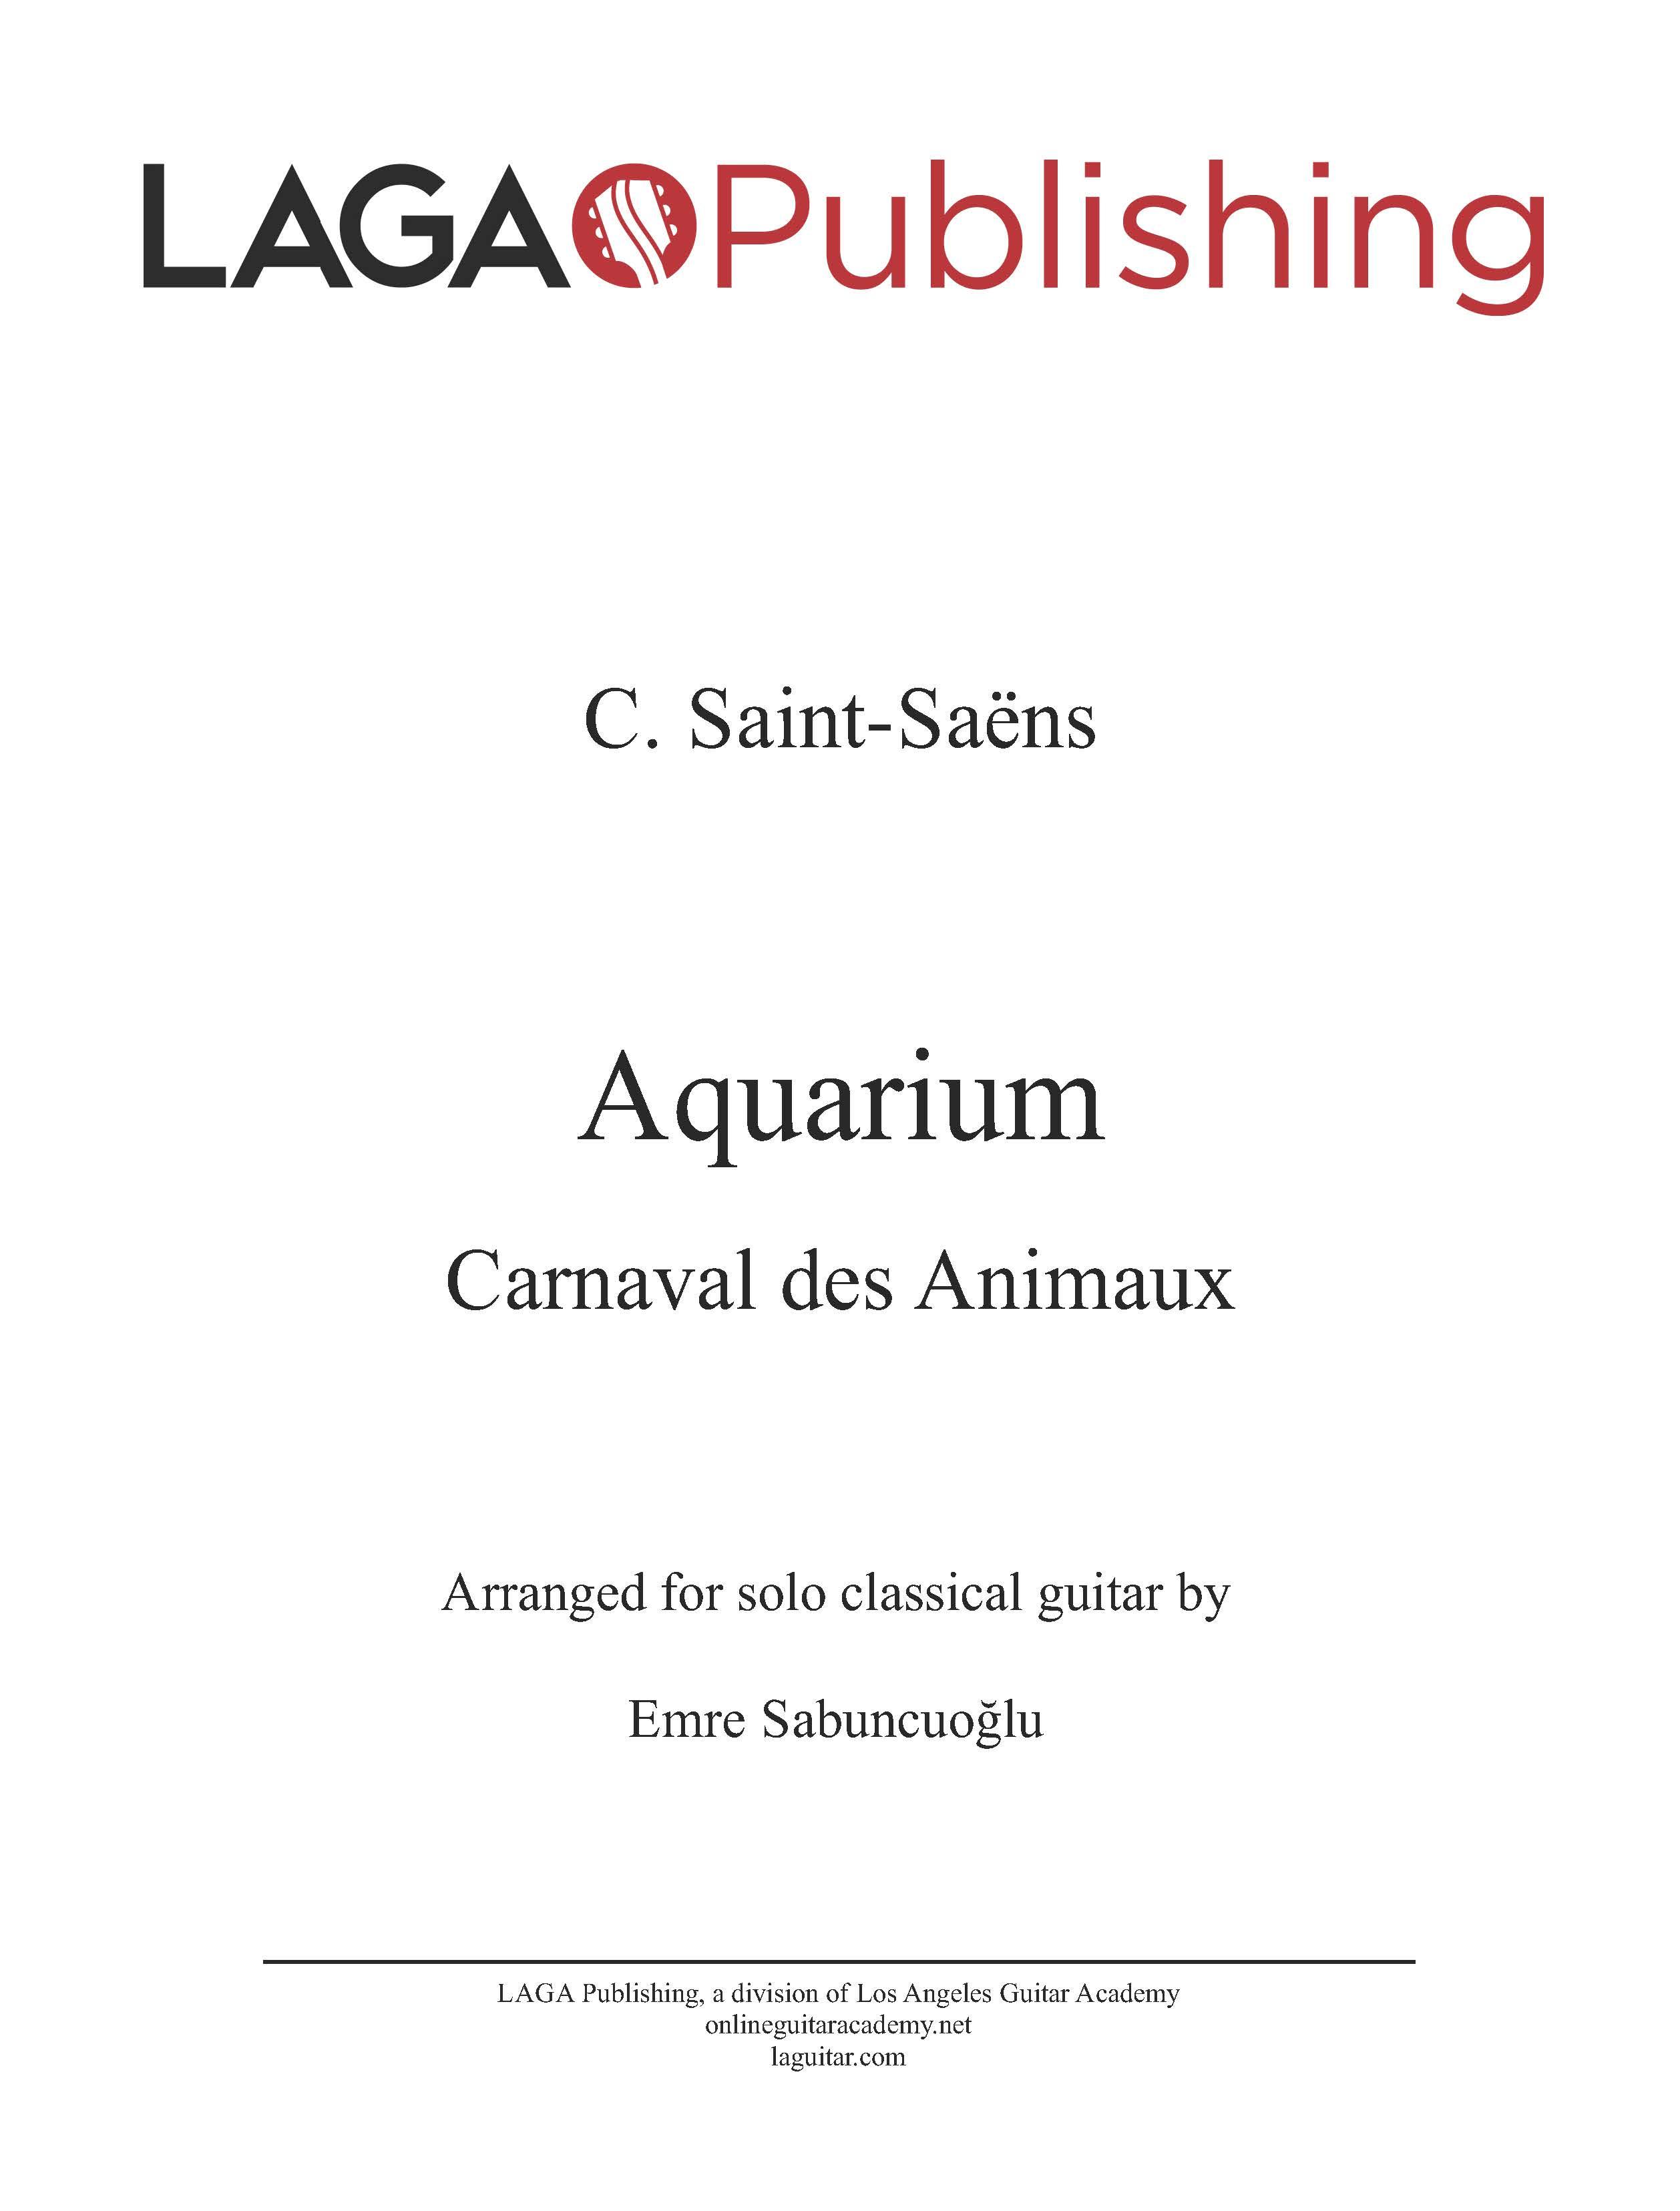 Aquarium by C  Saint-Saens for classical guitar